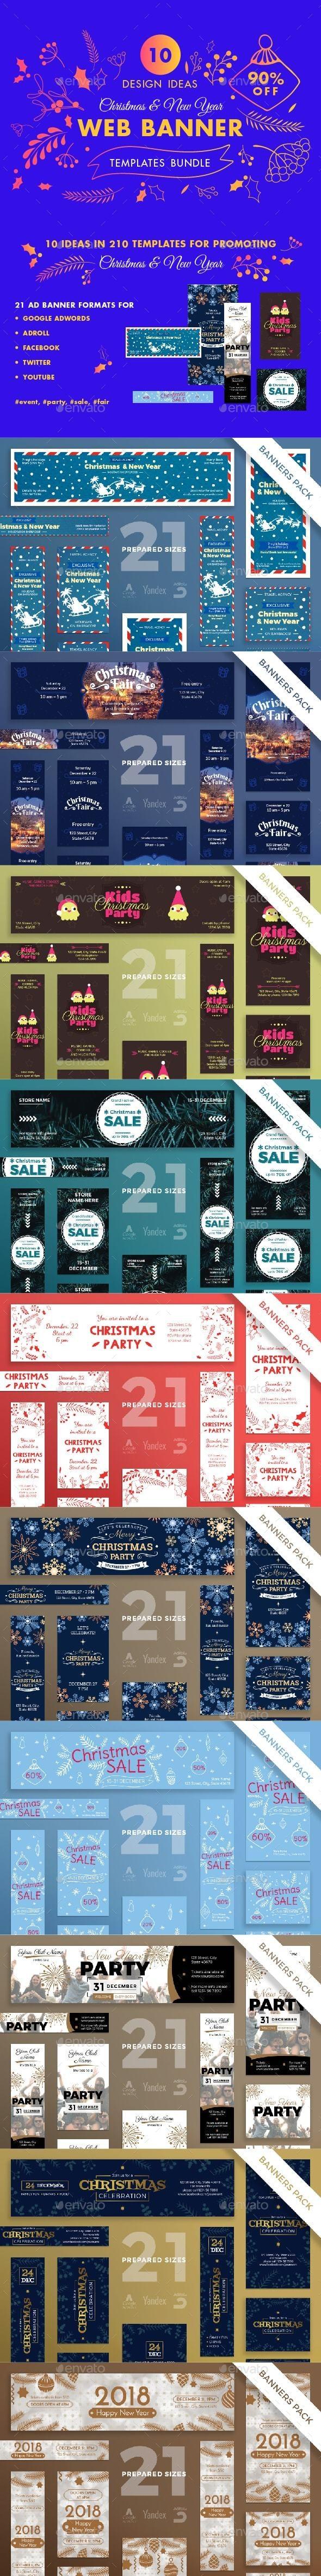 Christmas Web Banner Design Templates Bundle - Banners & Ads Web Elements